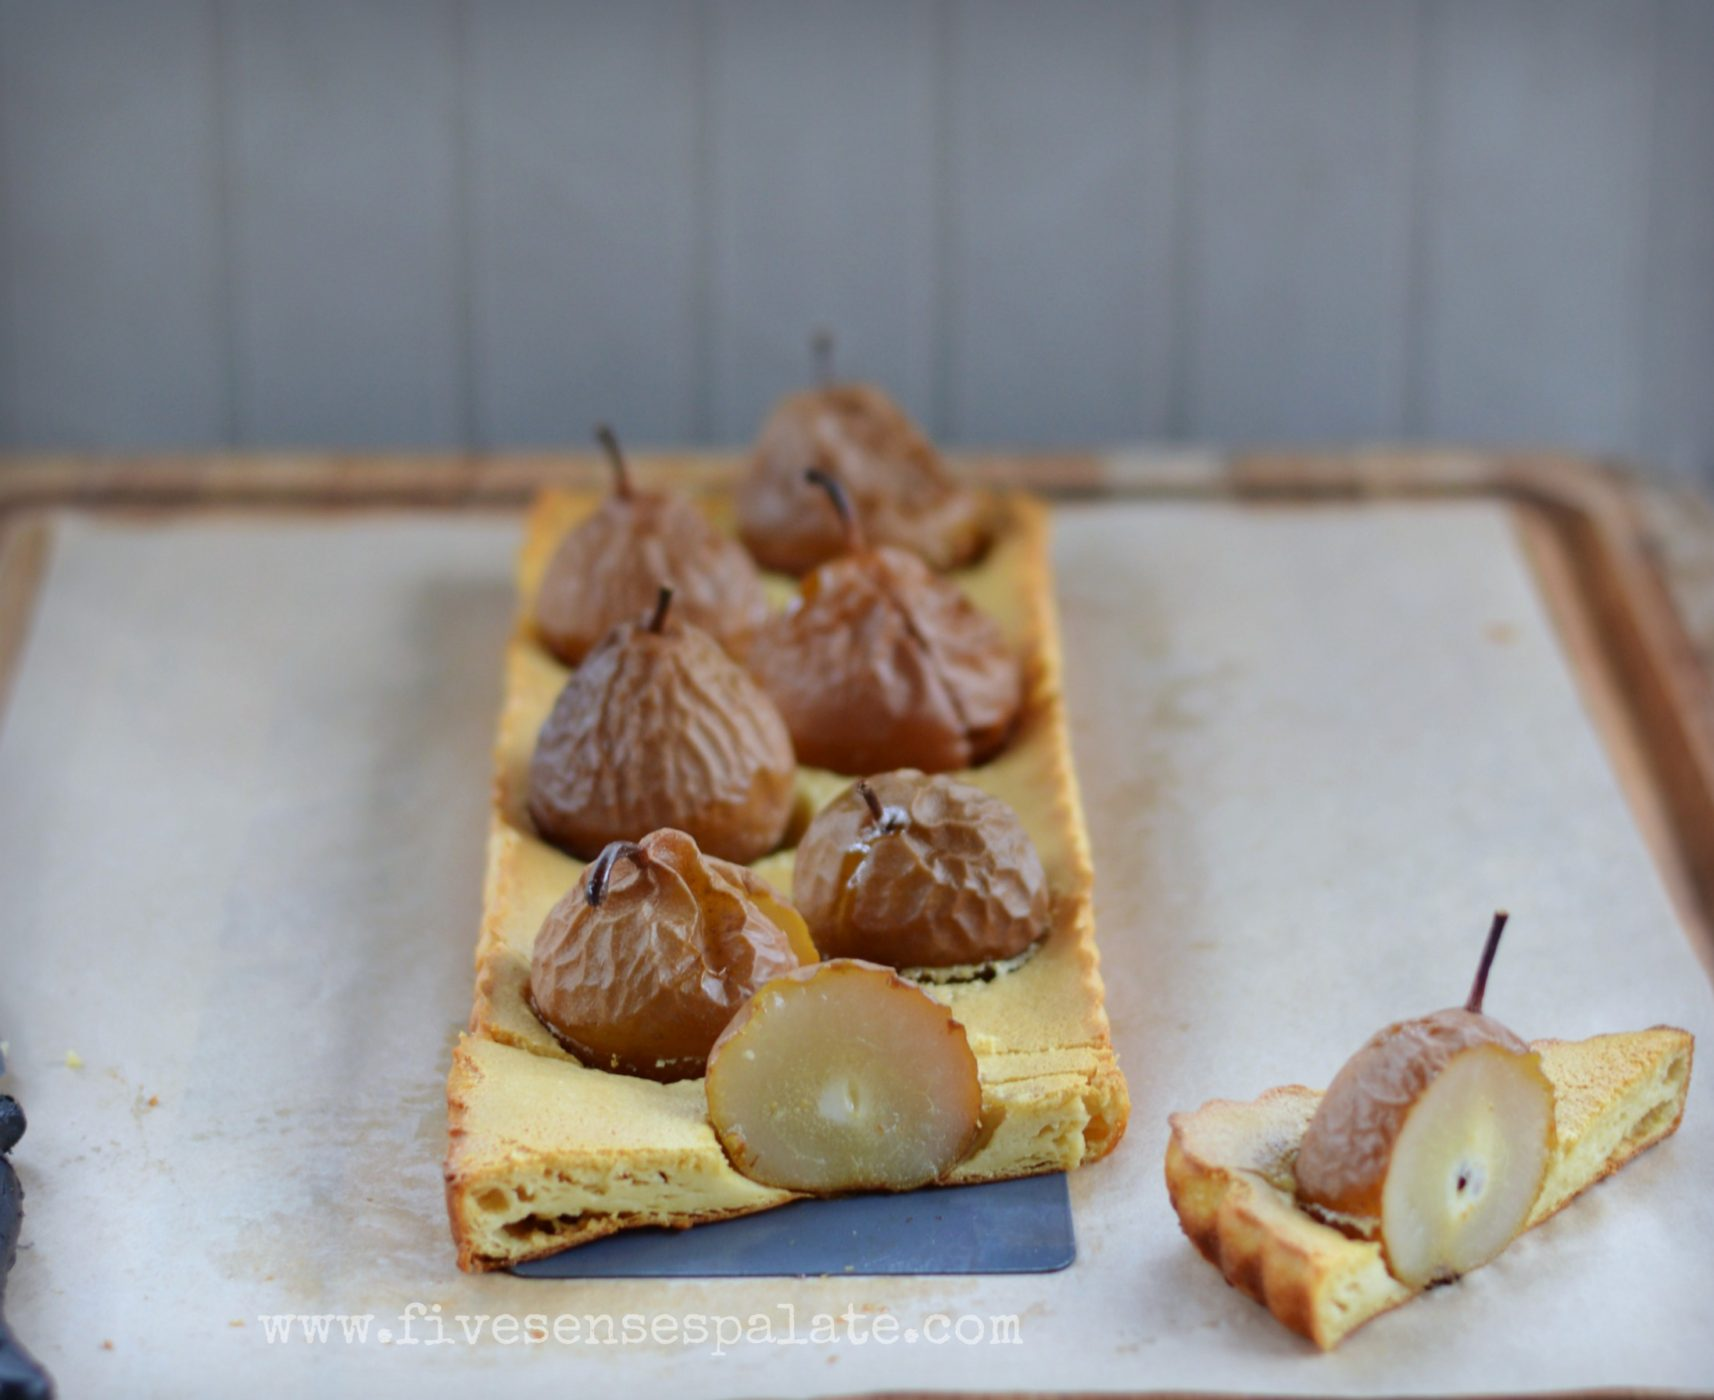 Seckel Pear & Almond Custard Tart | Five Senses Palate